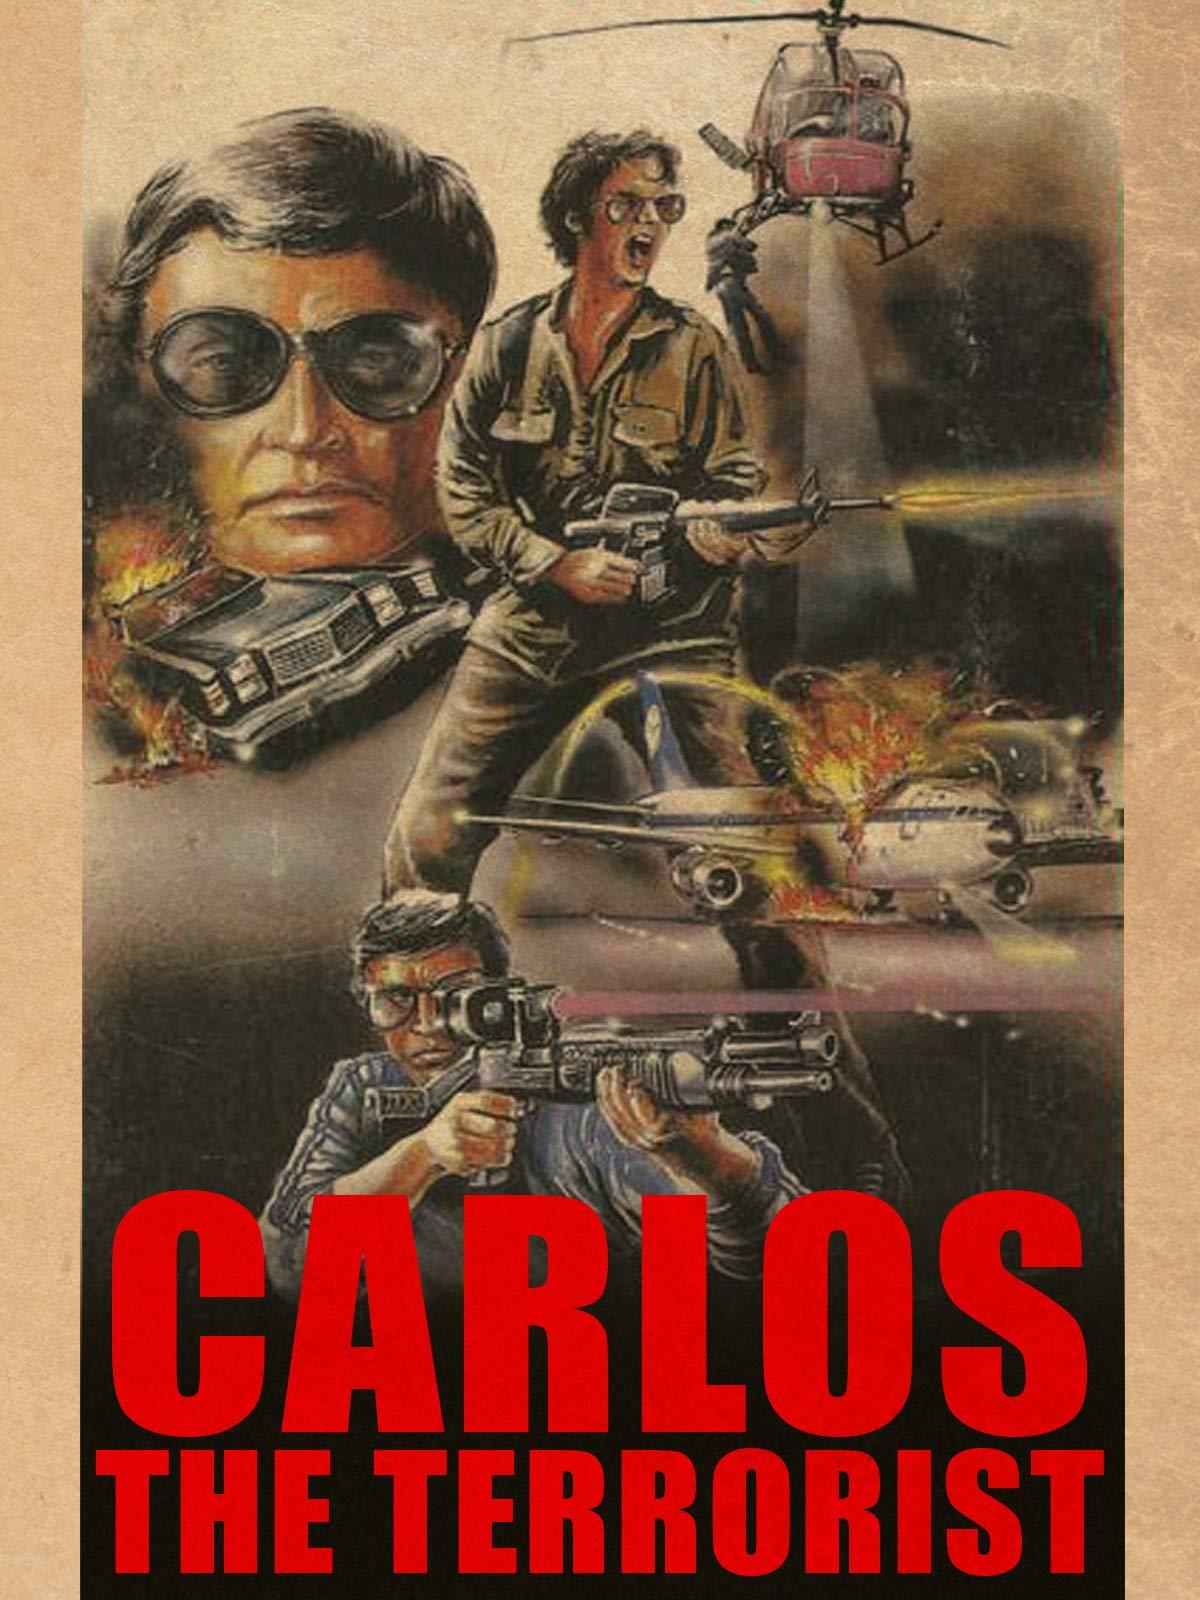 Carlos The Terrorist on Amazon Prime Video UK